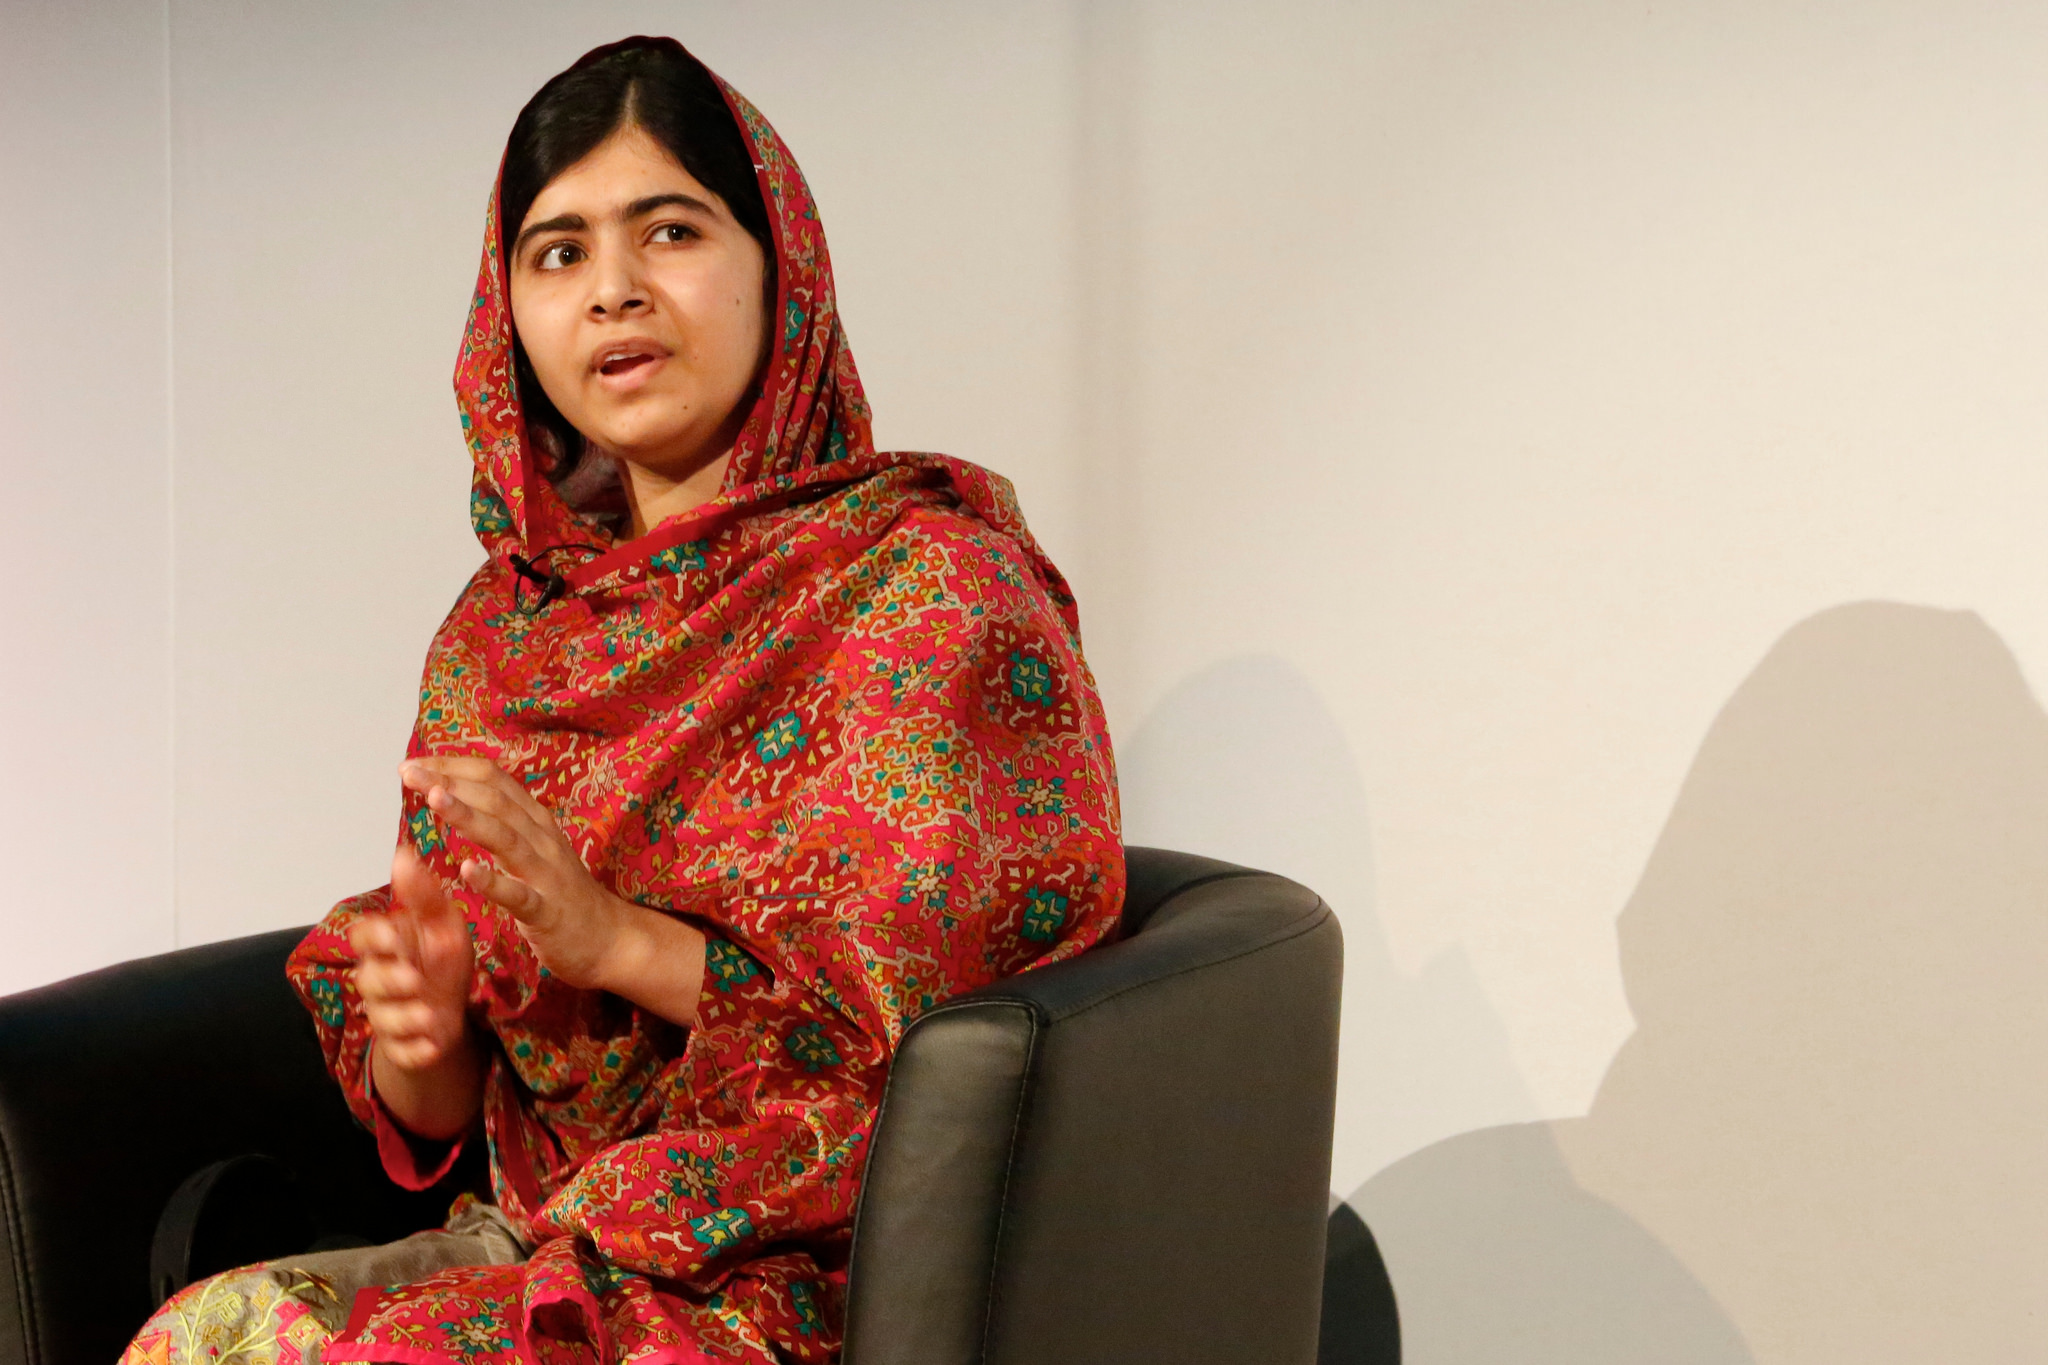 Malala Yousafzai at Girl Summit 2014. (UK Department for International Development/Flickr)